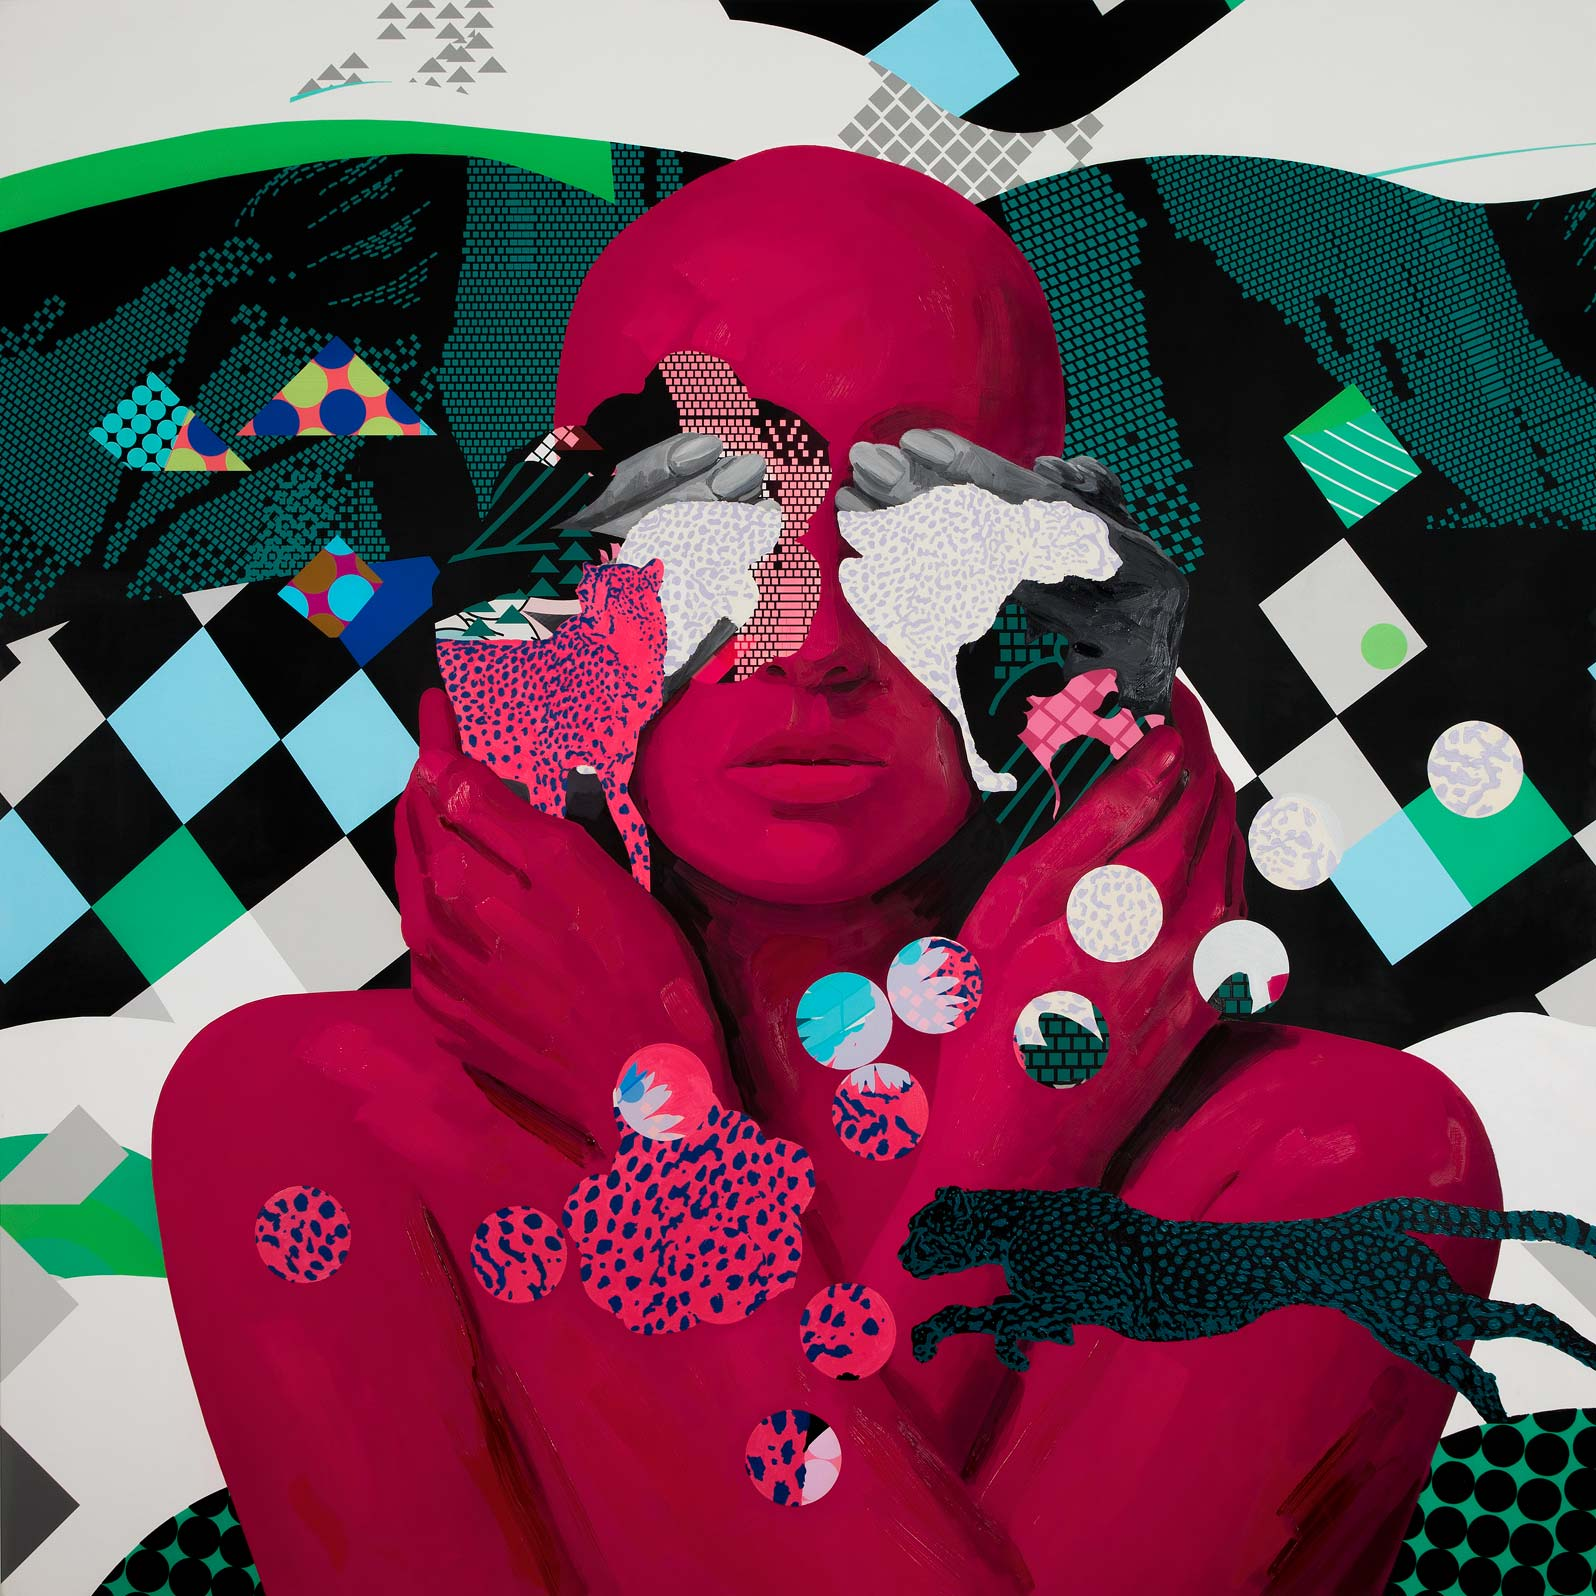 Anca Stefanescu | Mixed Media | PatternsOfPerception, Modern Art Paintings